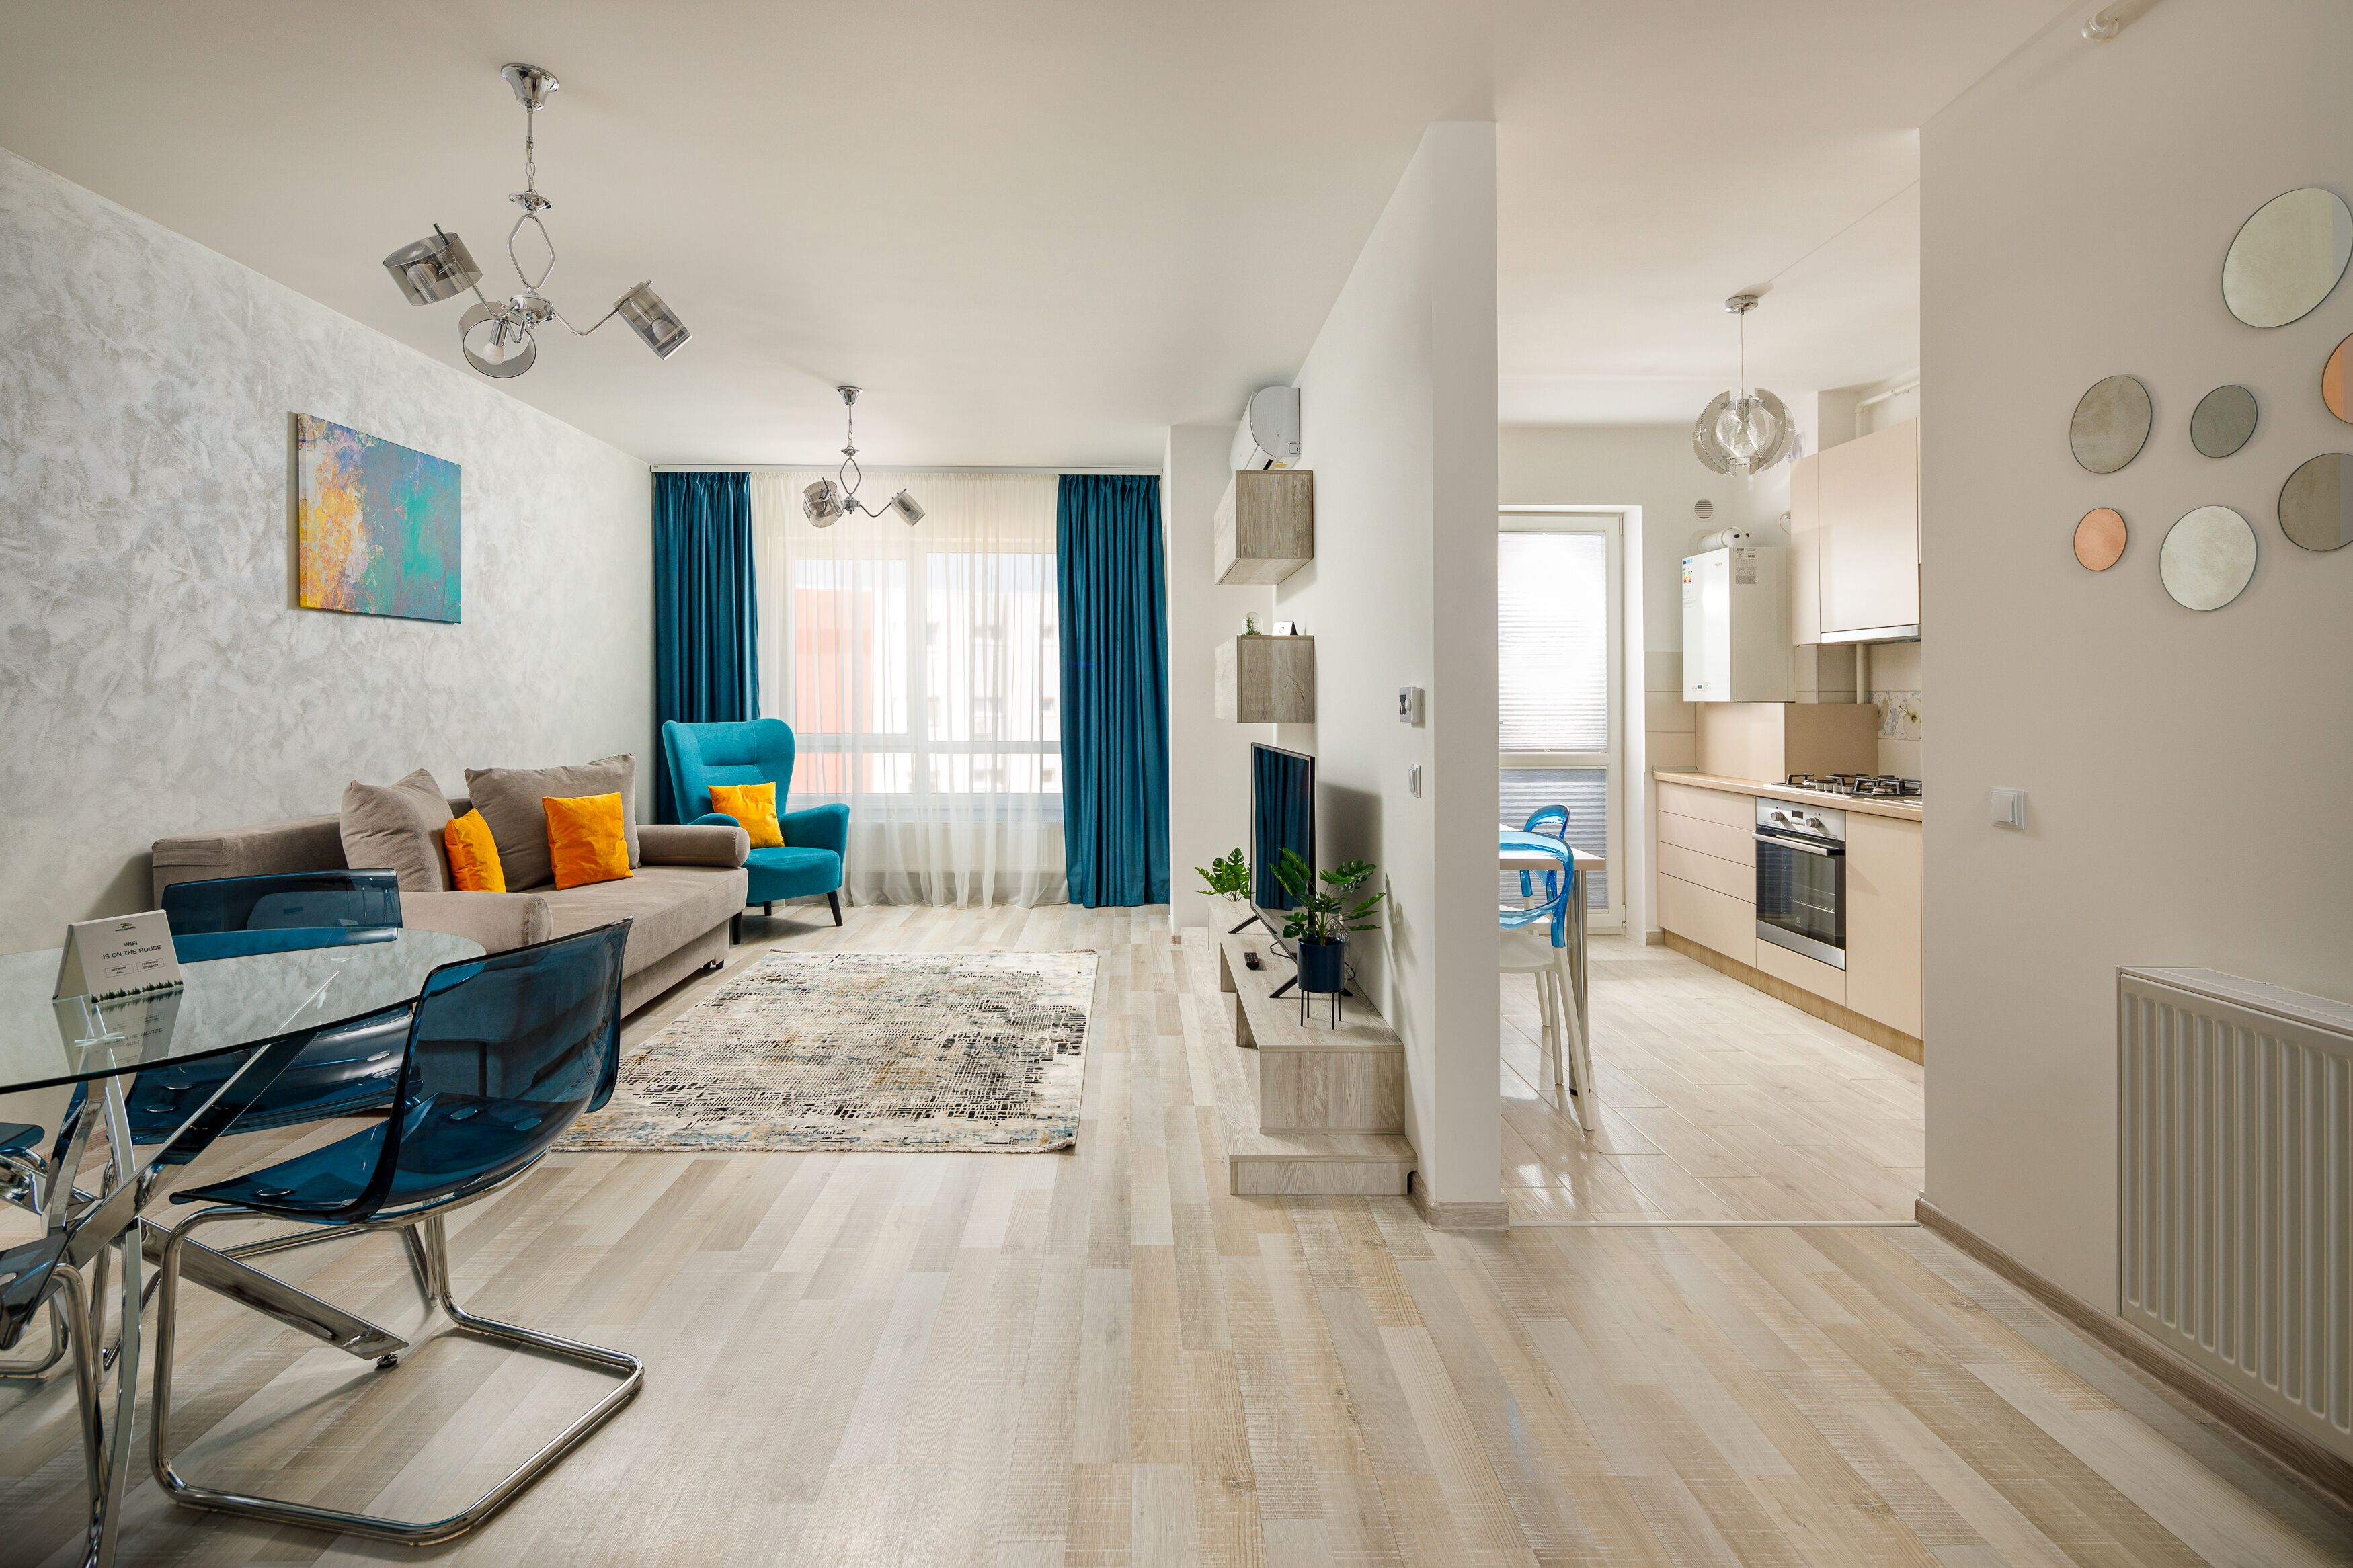 Brasov Holiday Apartments